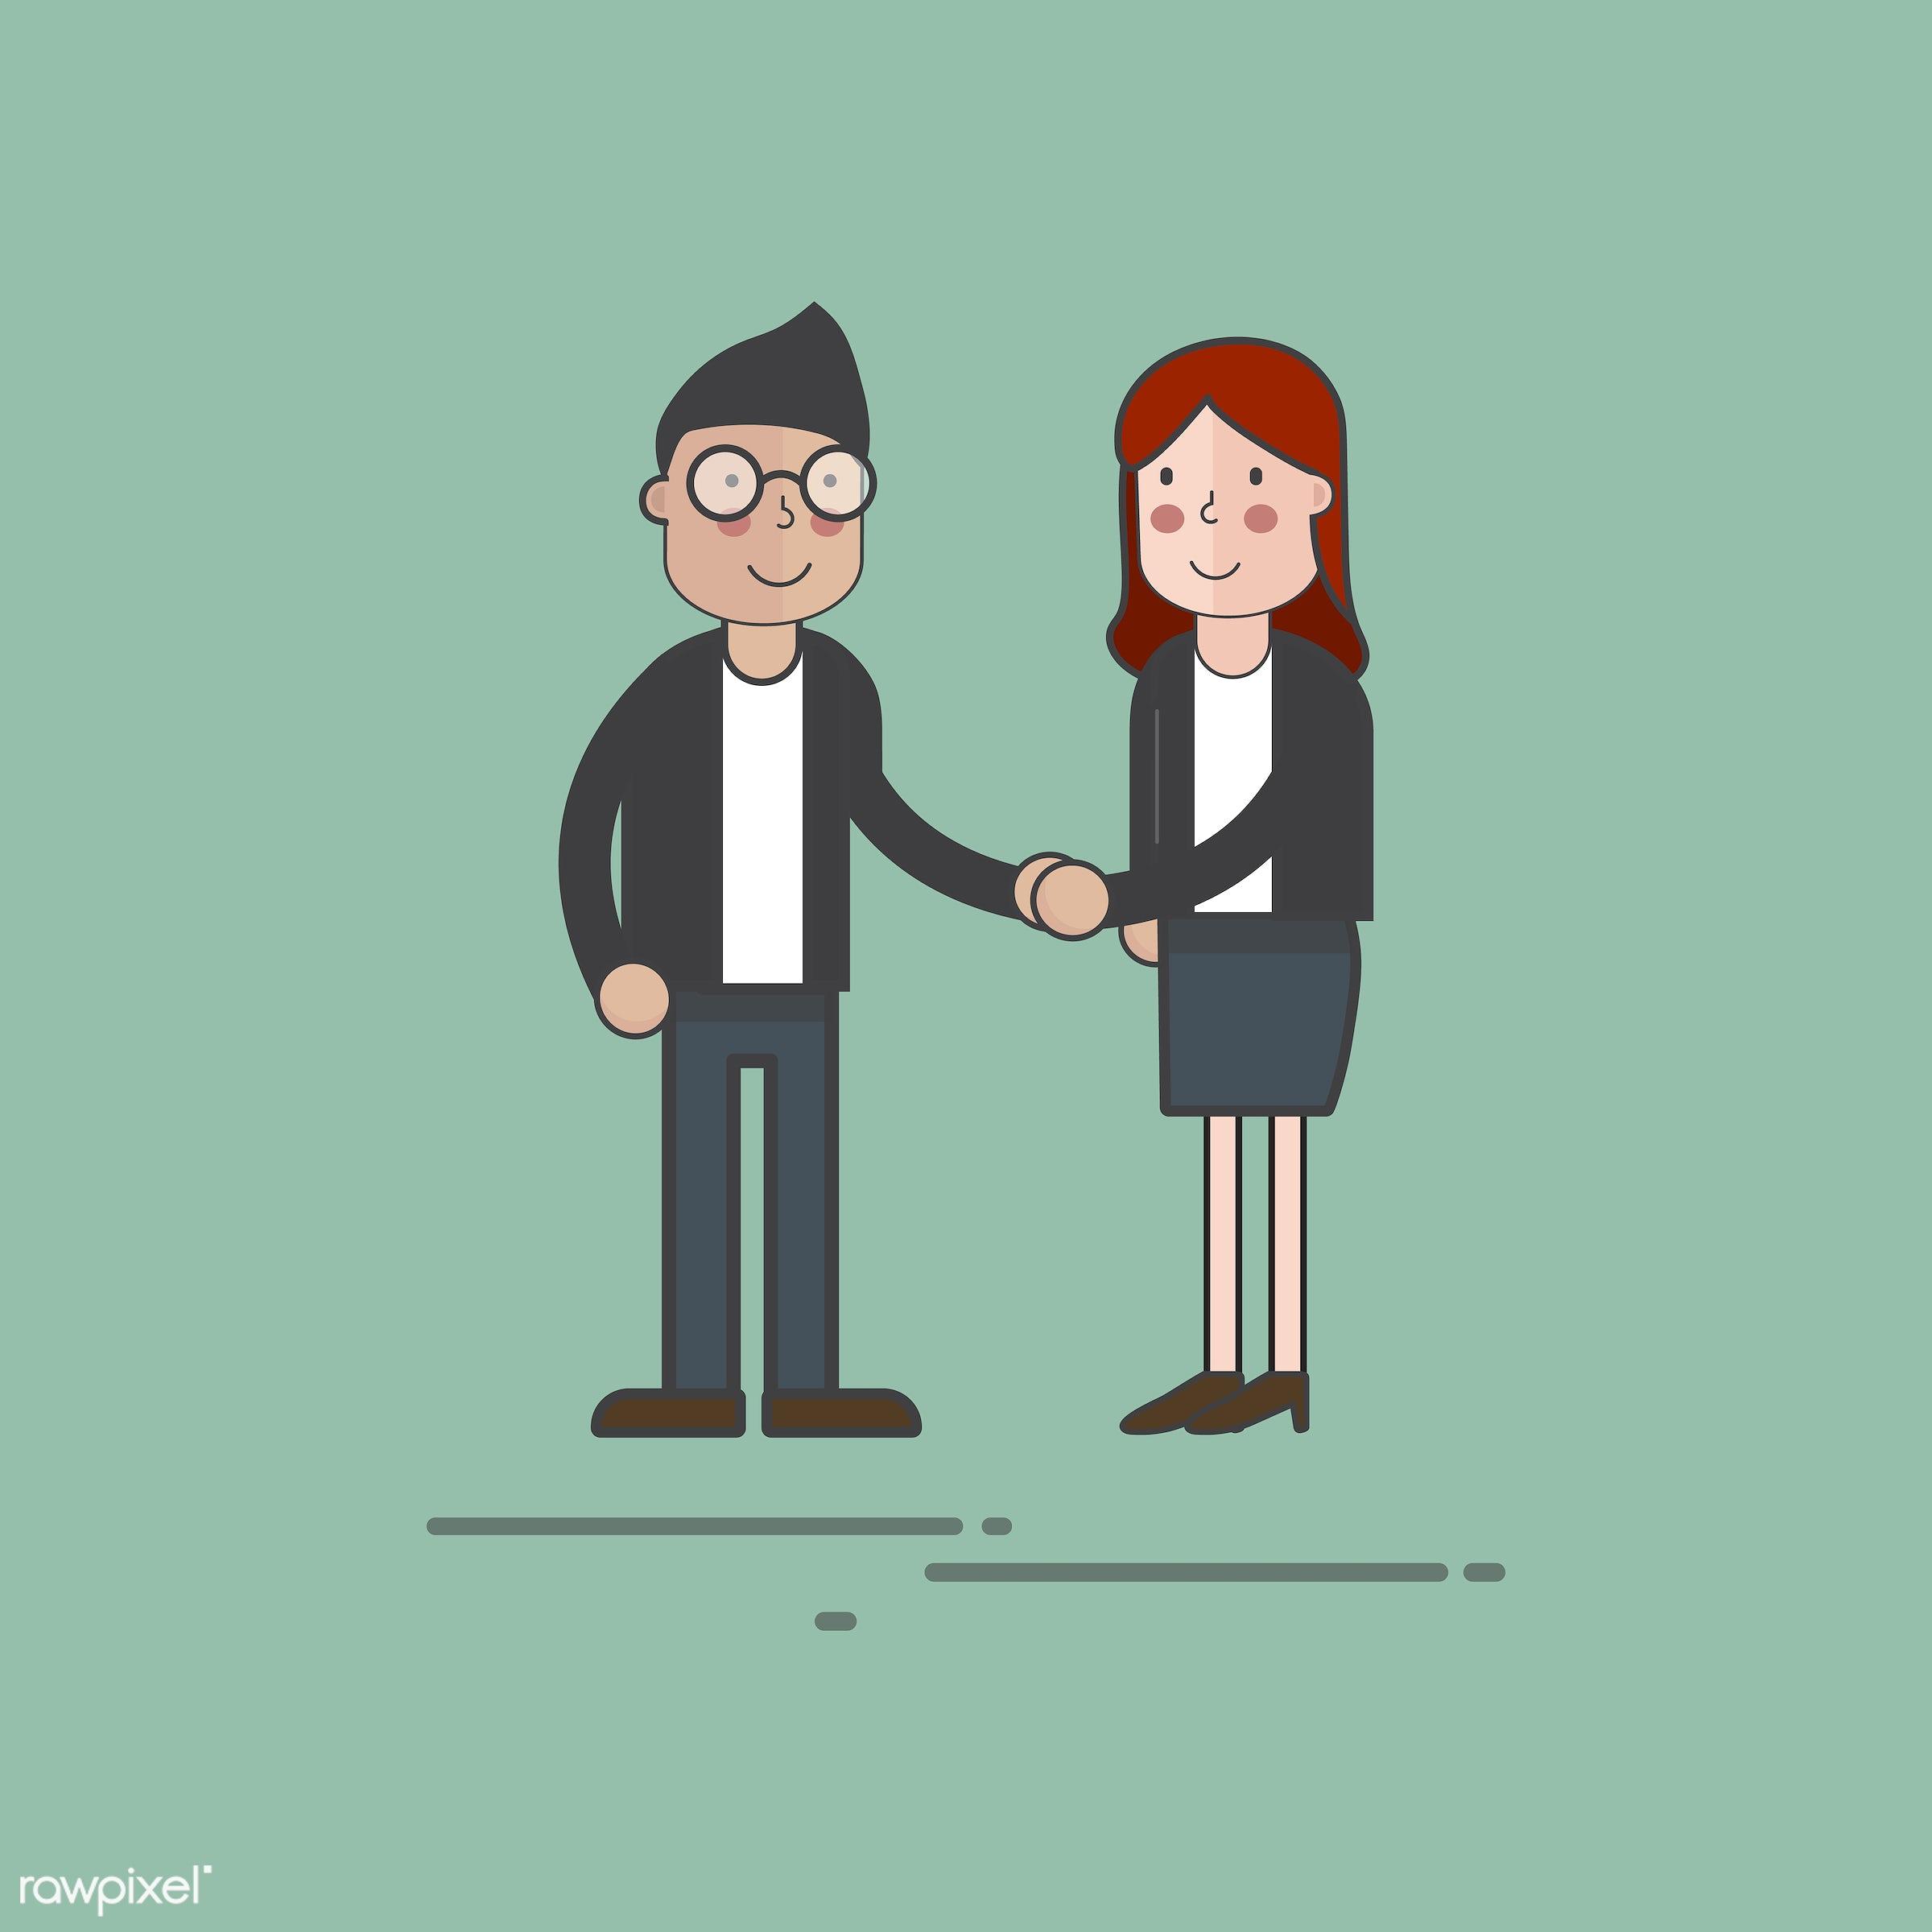 Illustration of people avatar - handshake, avatar, cartoon, character, couple, drawing, emotion, graphic, greeting,...